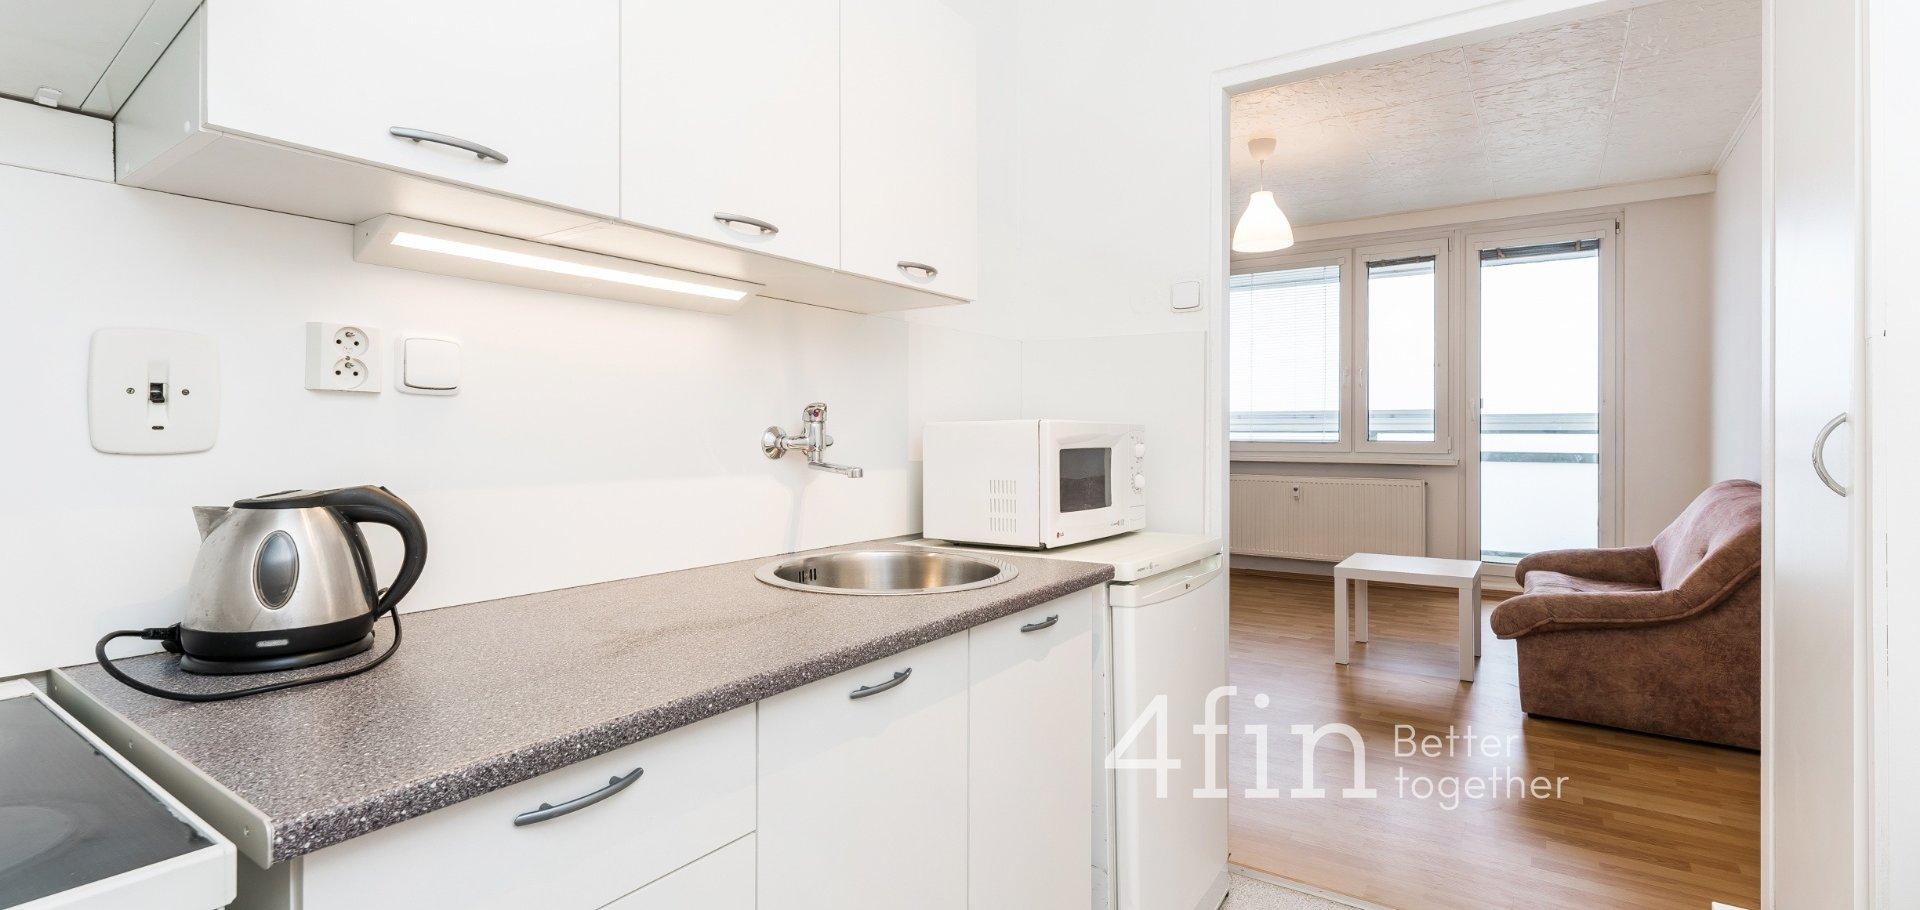 Pronájem bytu 2+kk, 45m² - Praha - Braník